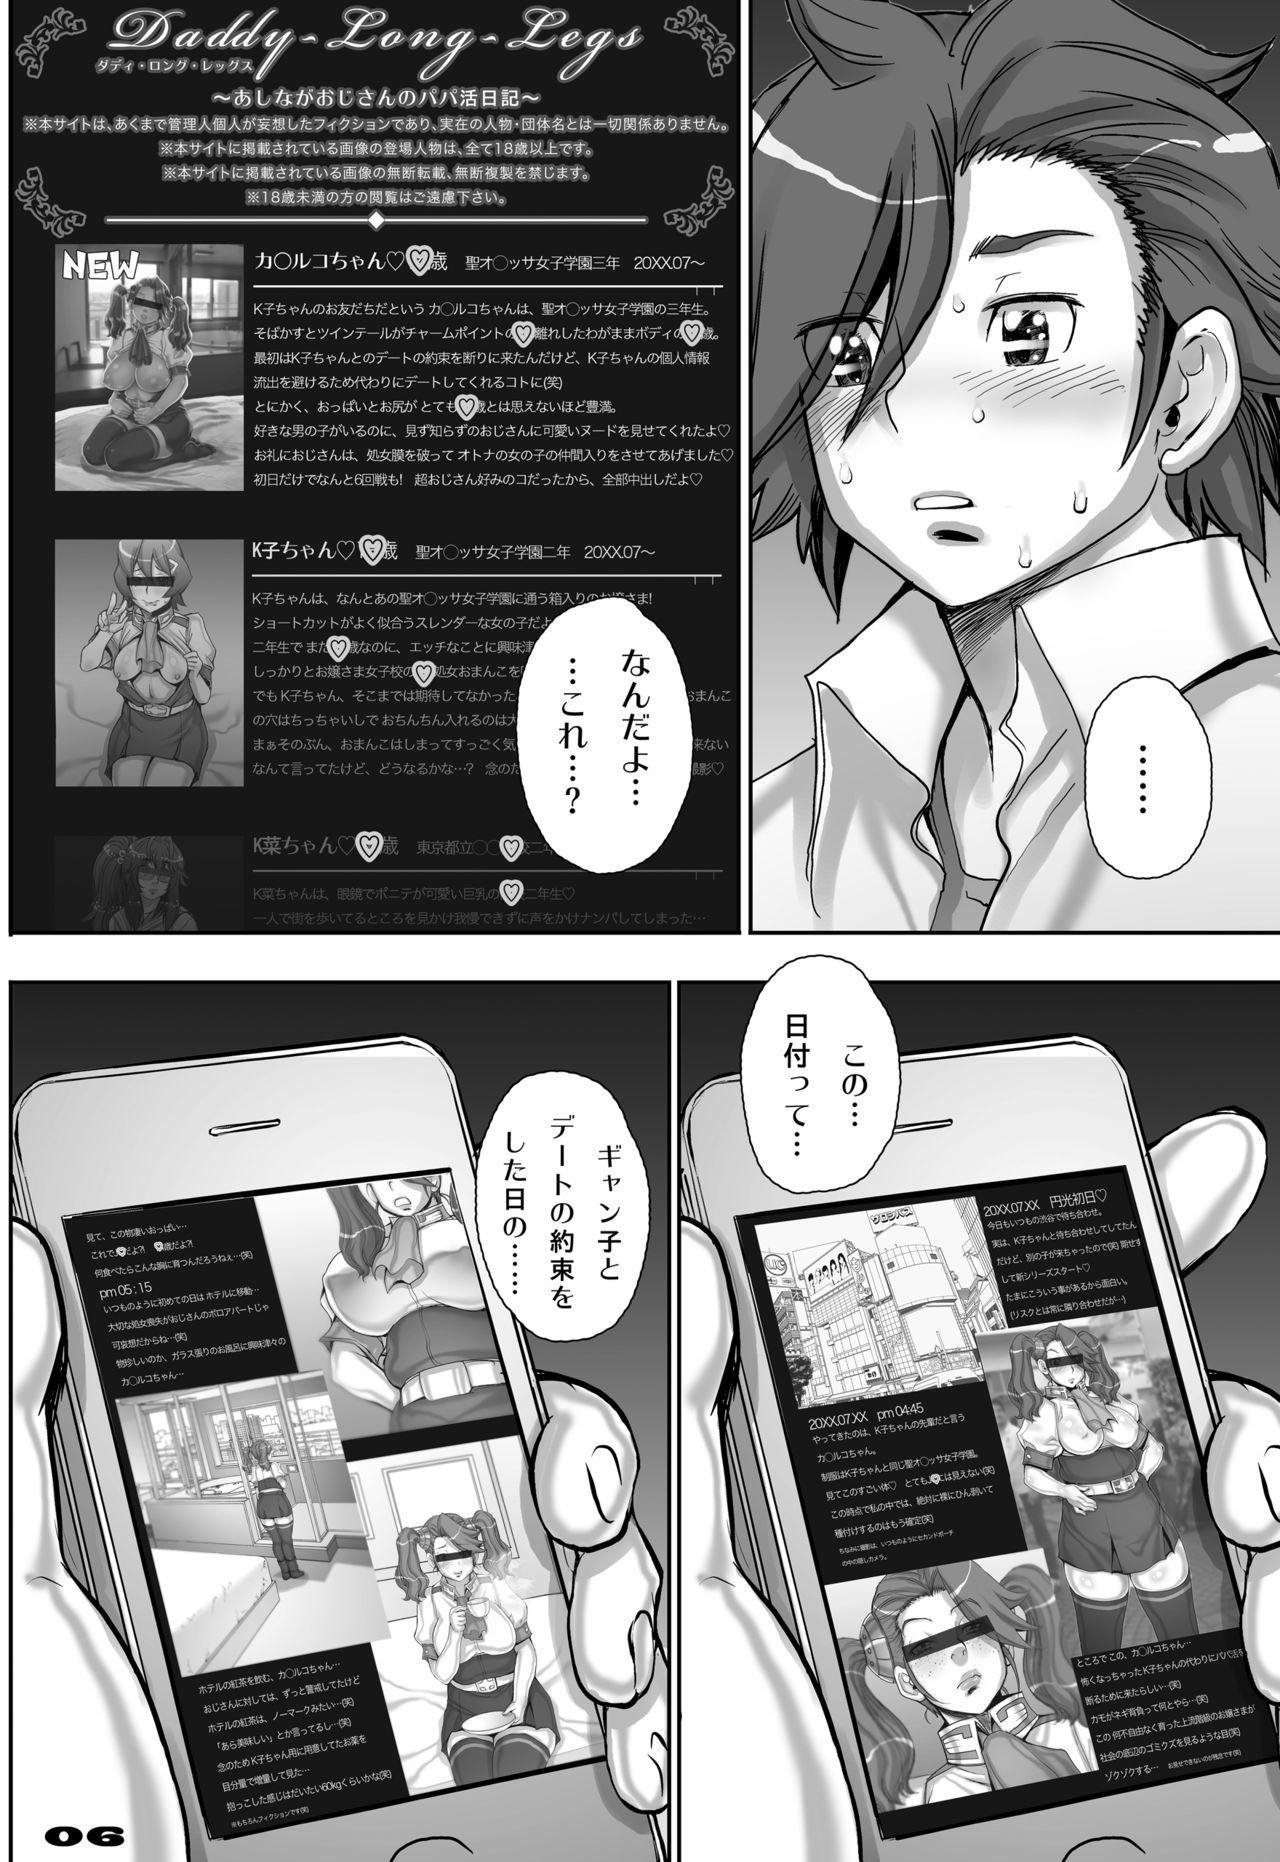 [Studio Tapa Tapa (Sengoku-kun)] Daddy-Long-Legs #3 (Gundam Build Fighters Try) [Digital] 5